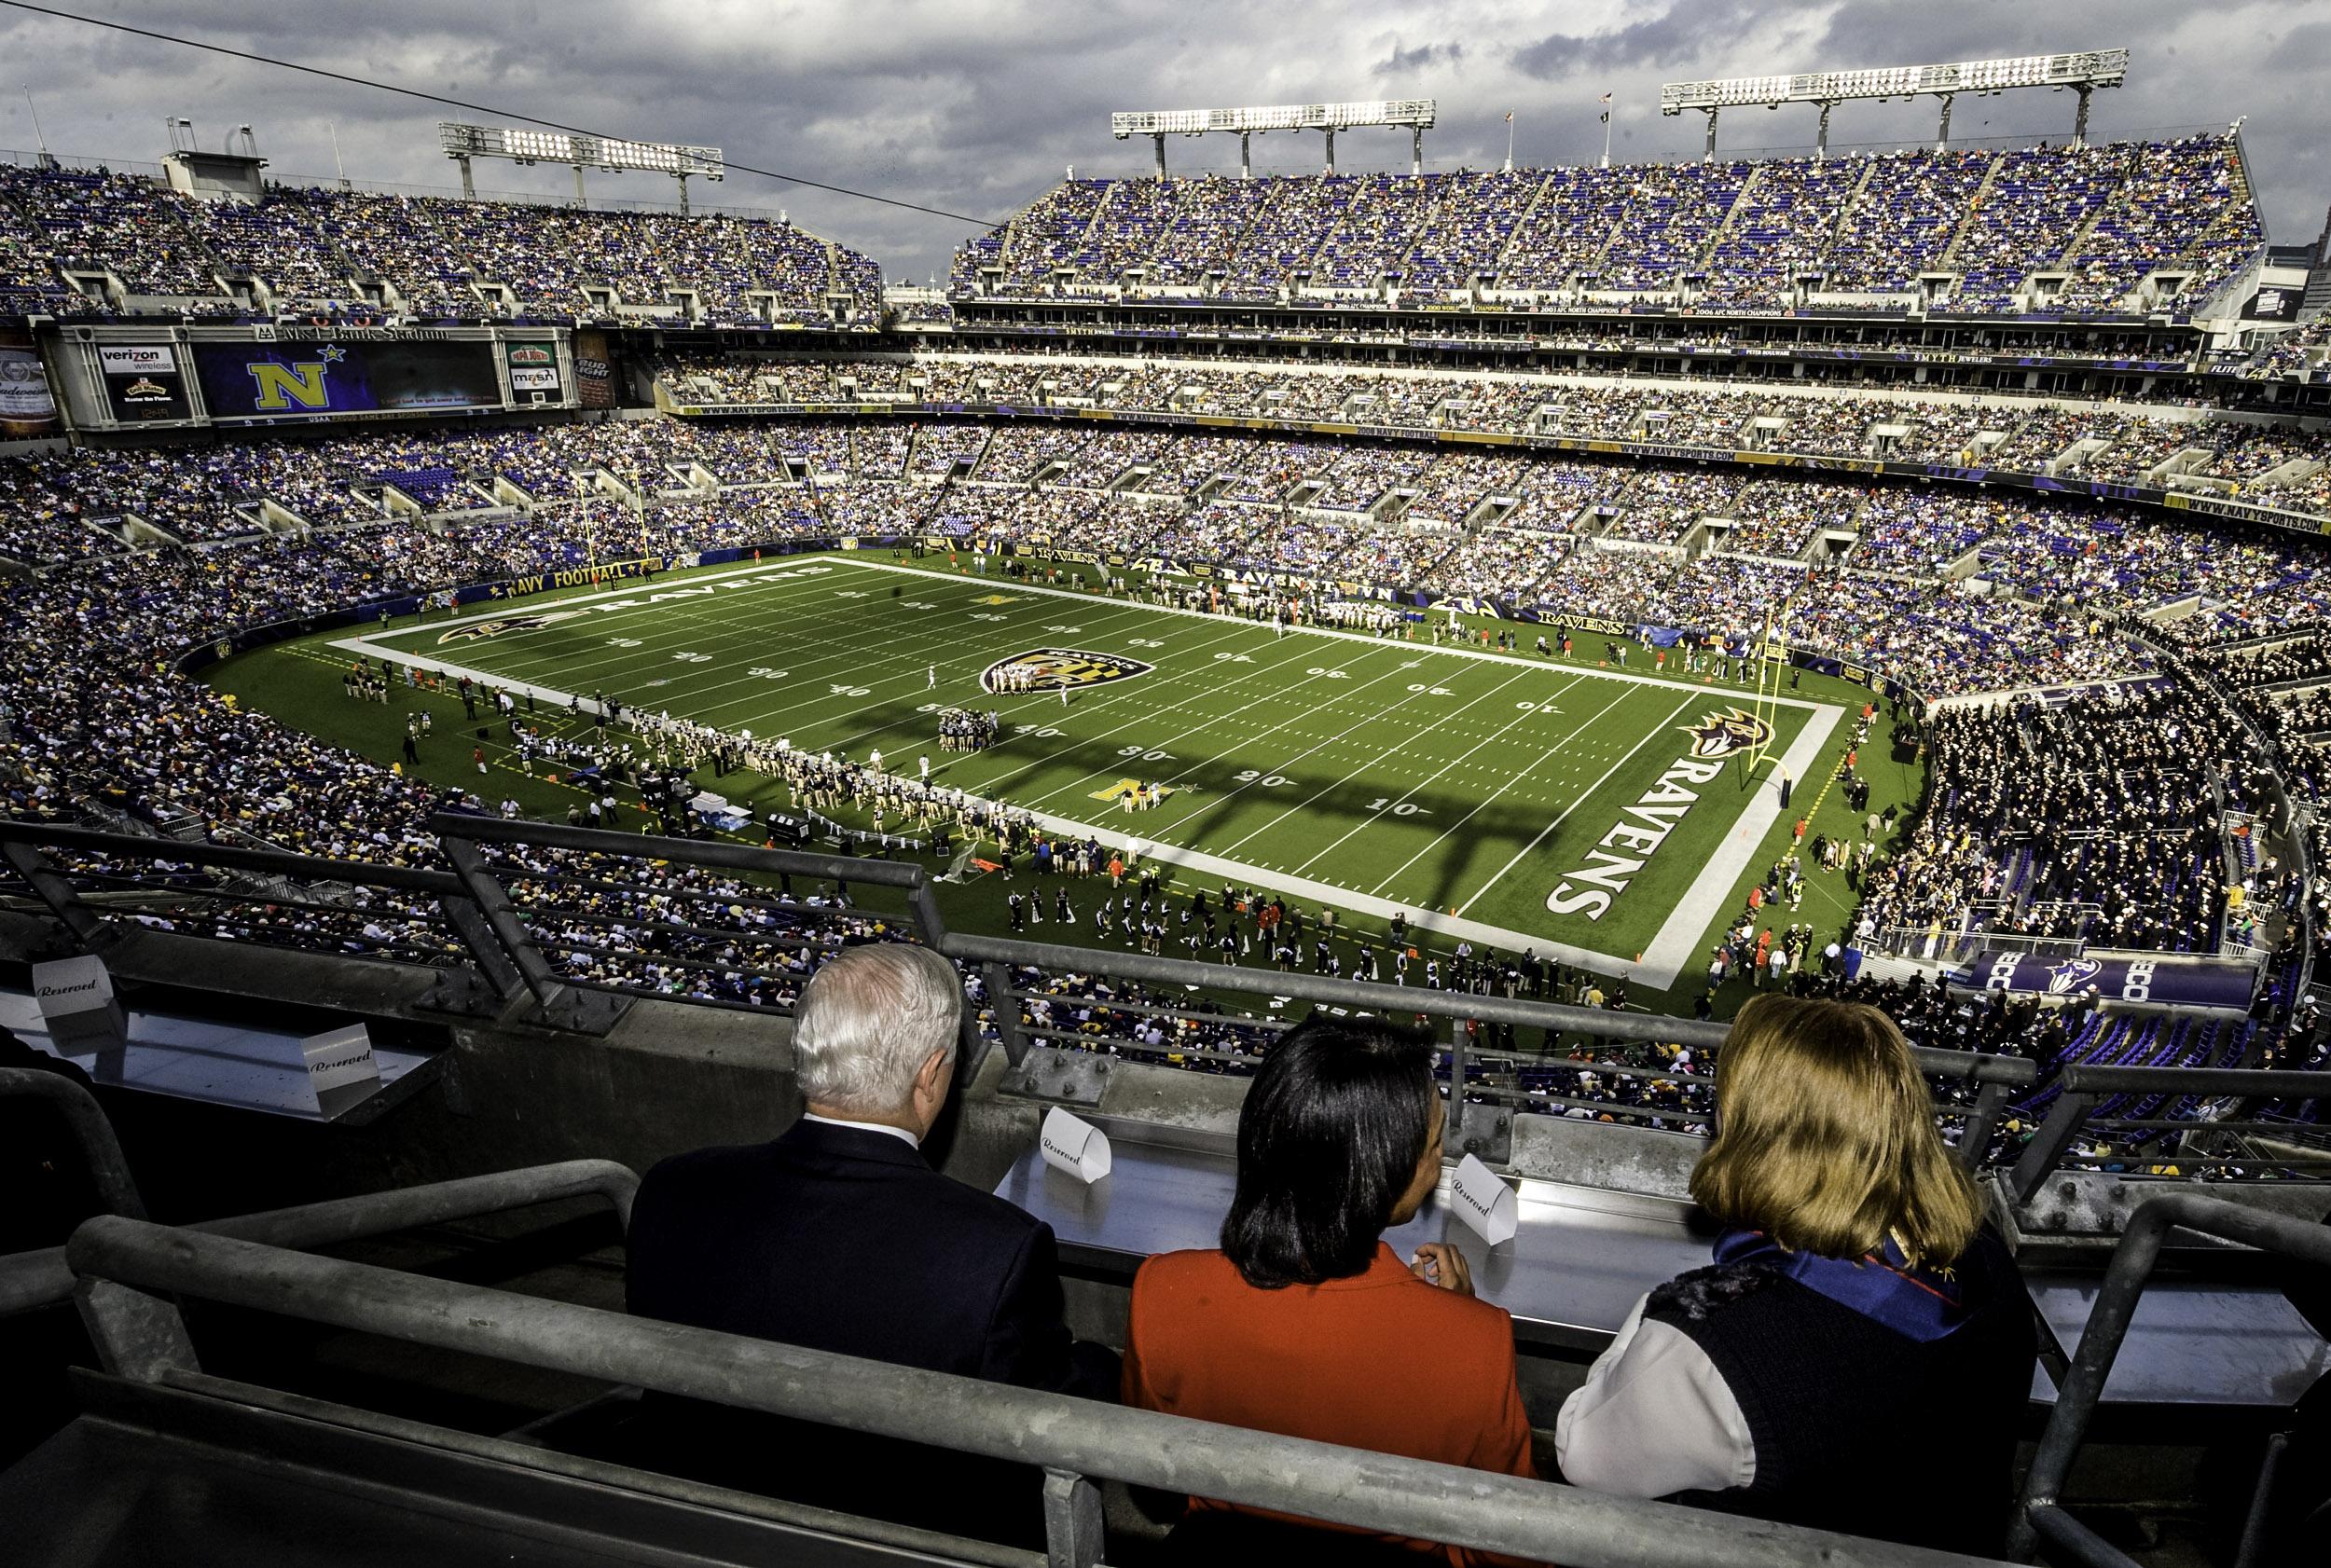 Il prestigioso stadio dei Baltimore Ravens